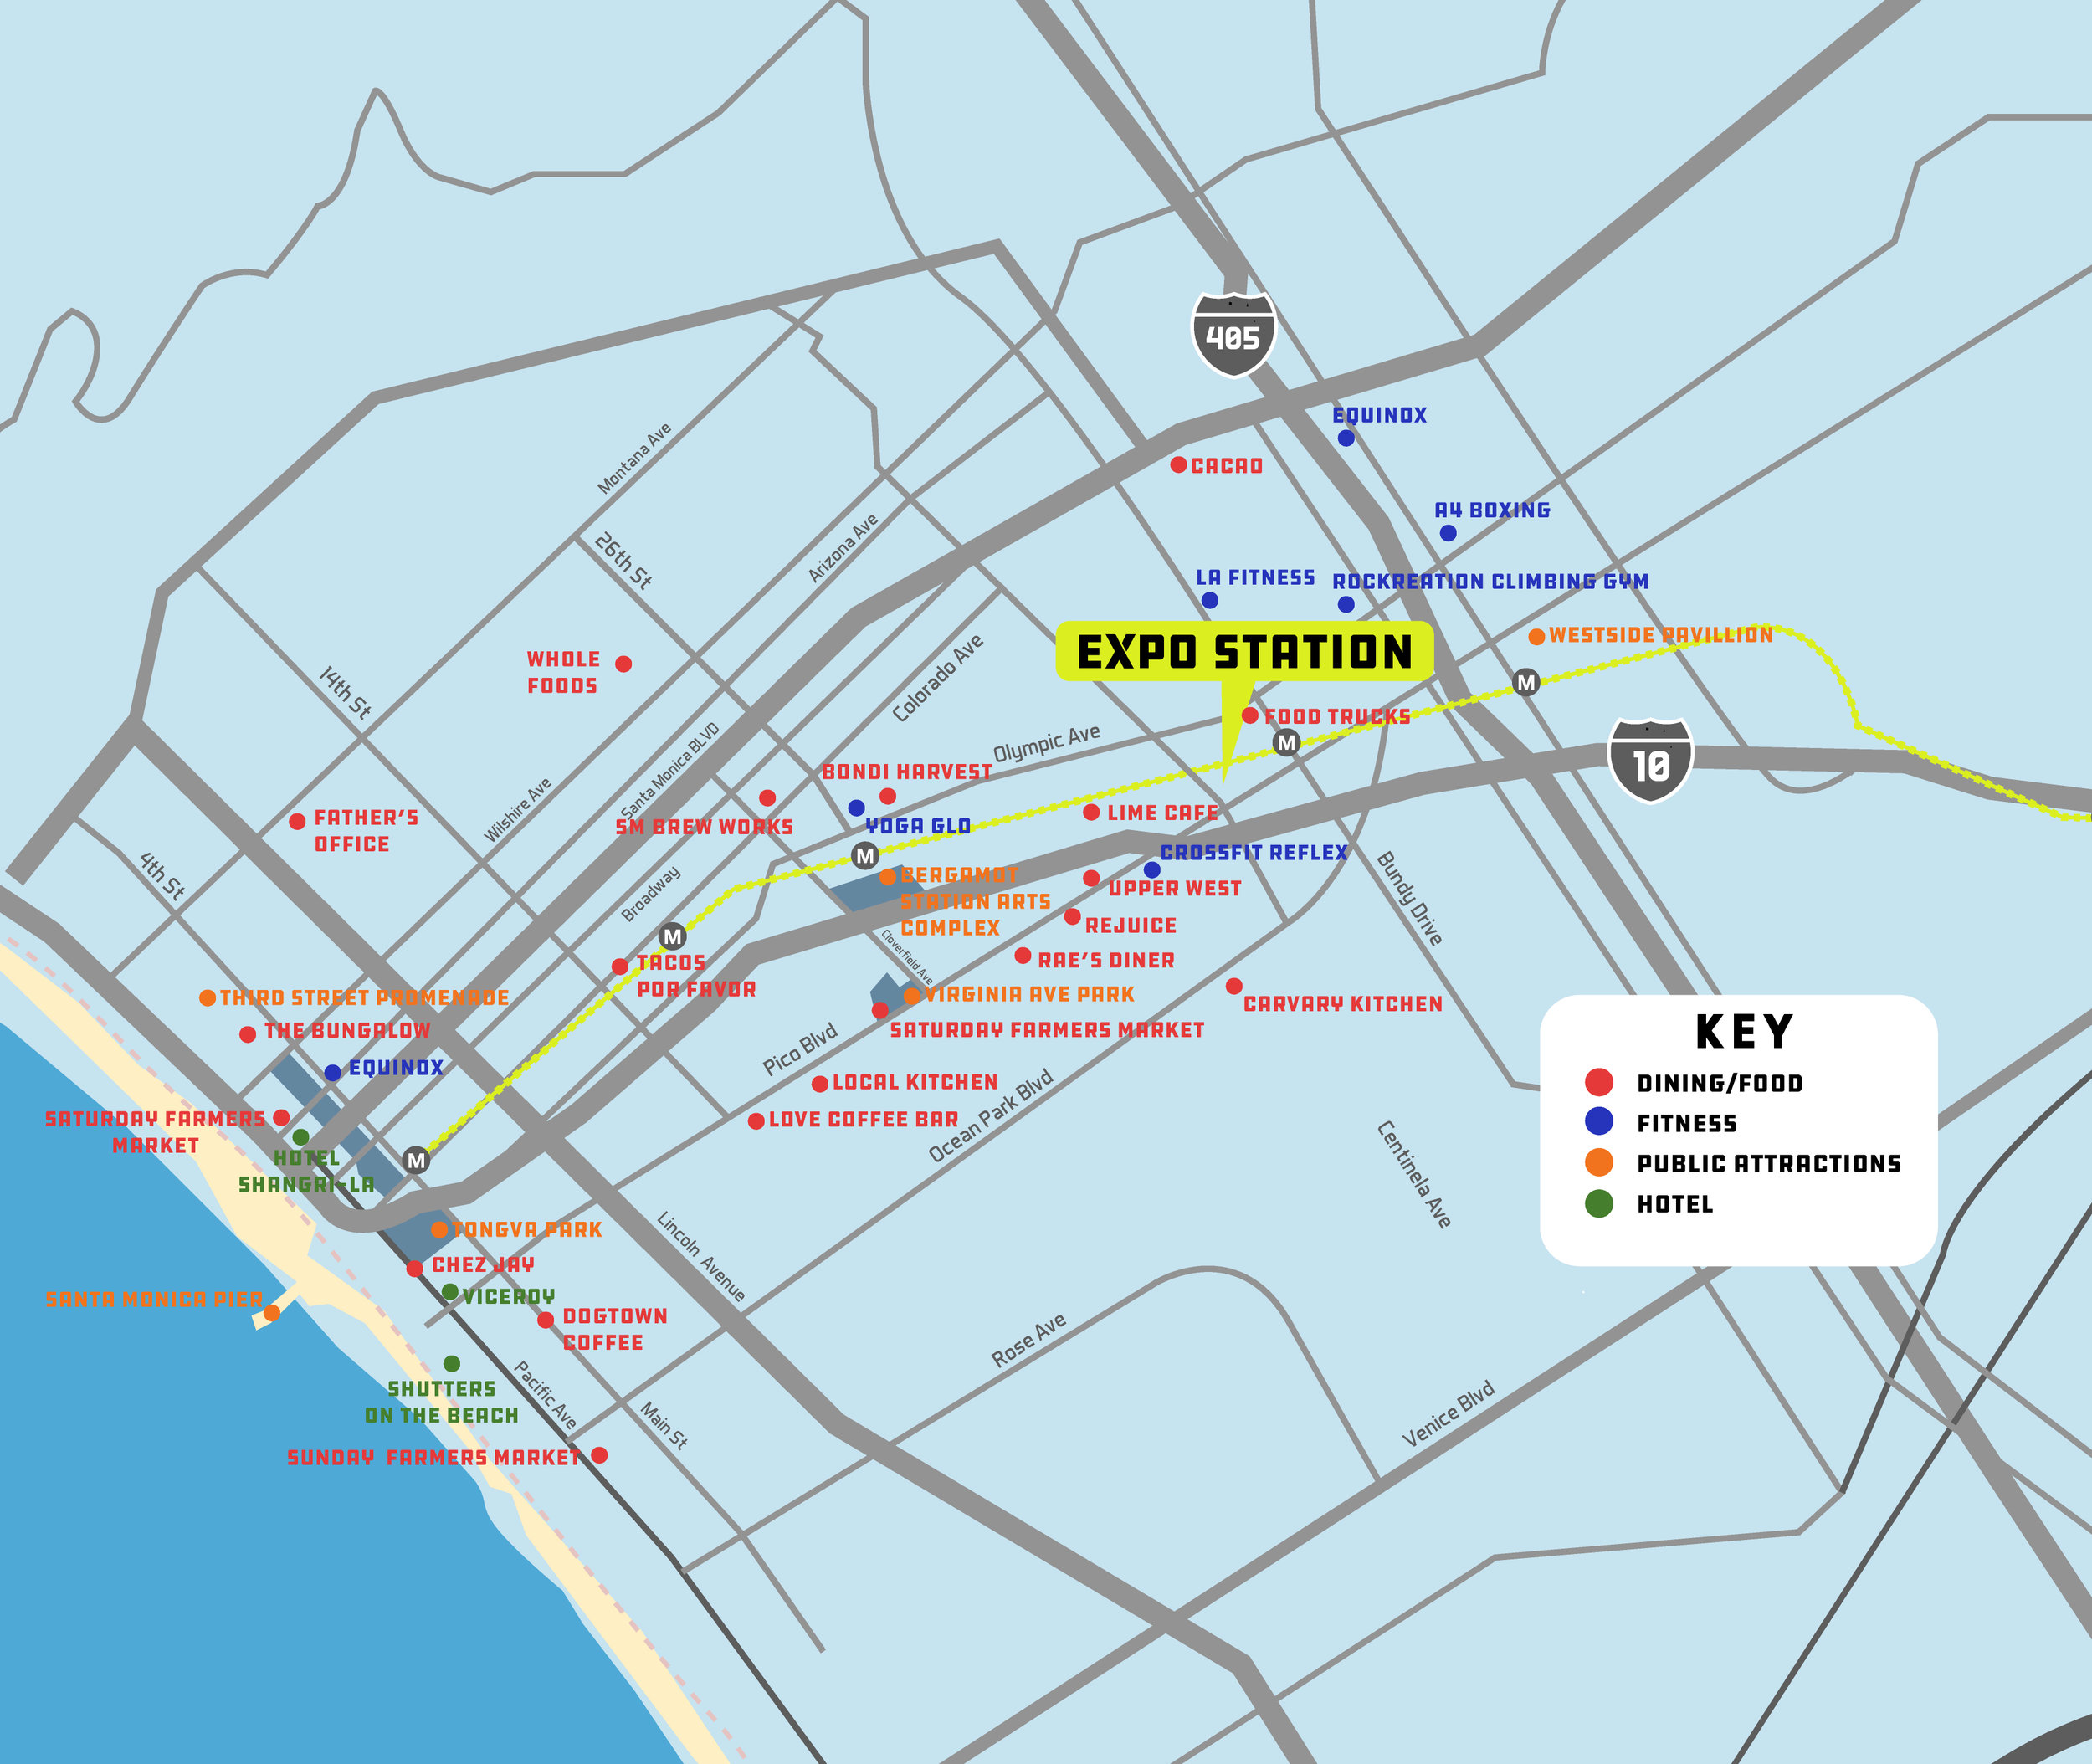 AMENITIESmap_EXPO.jpg